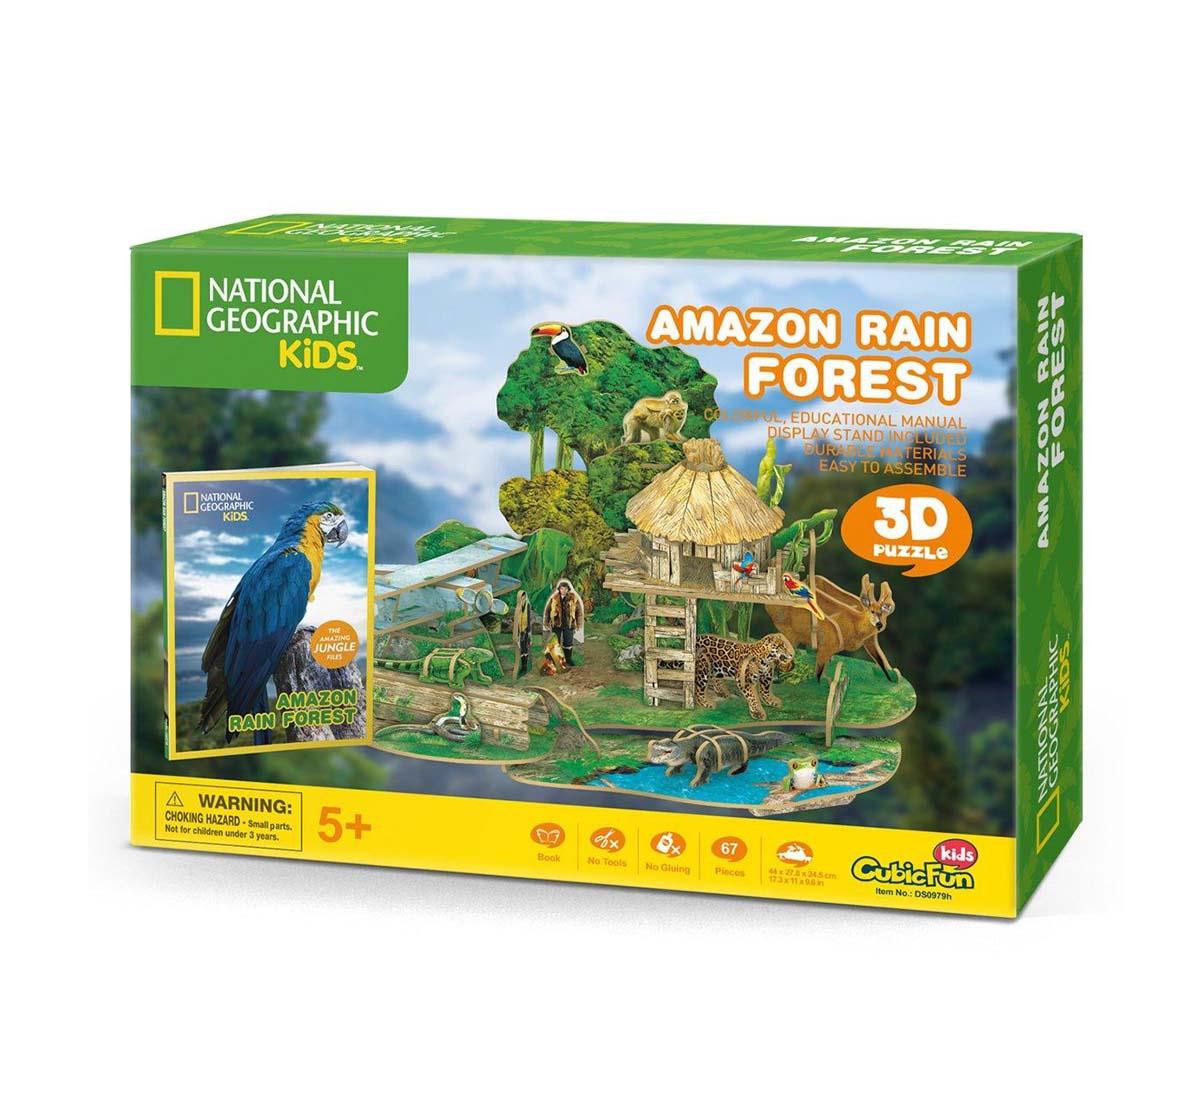 Cubic Fun | Cubicfun National Geographic Amazon Rainforest Puzzles for Kids Age 5Y+